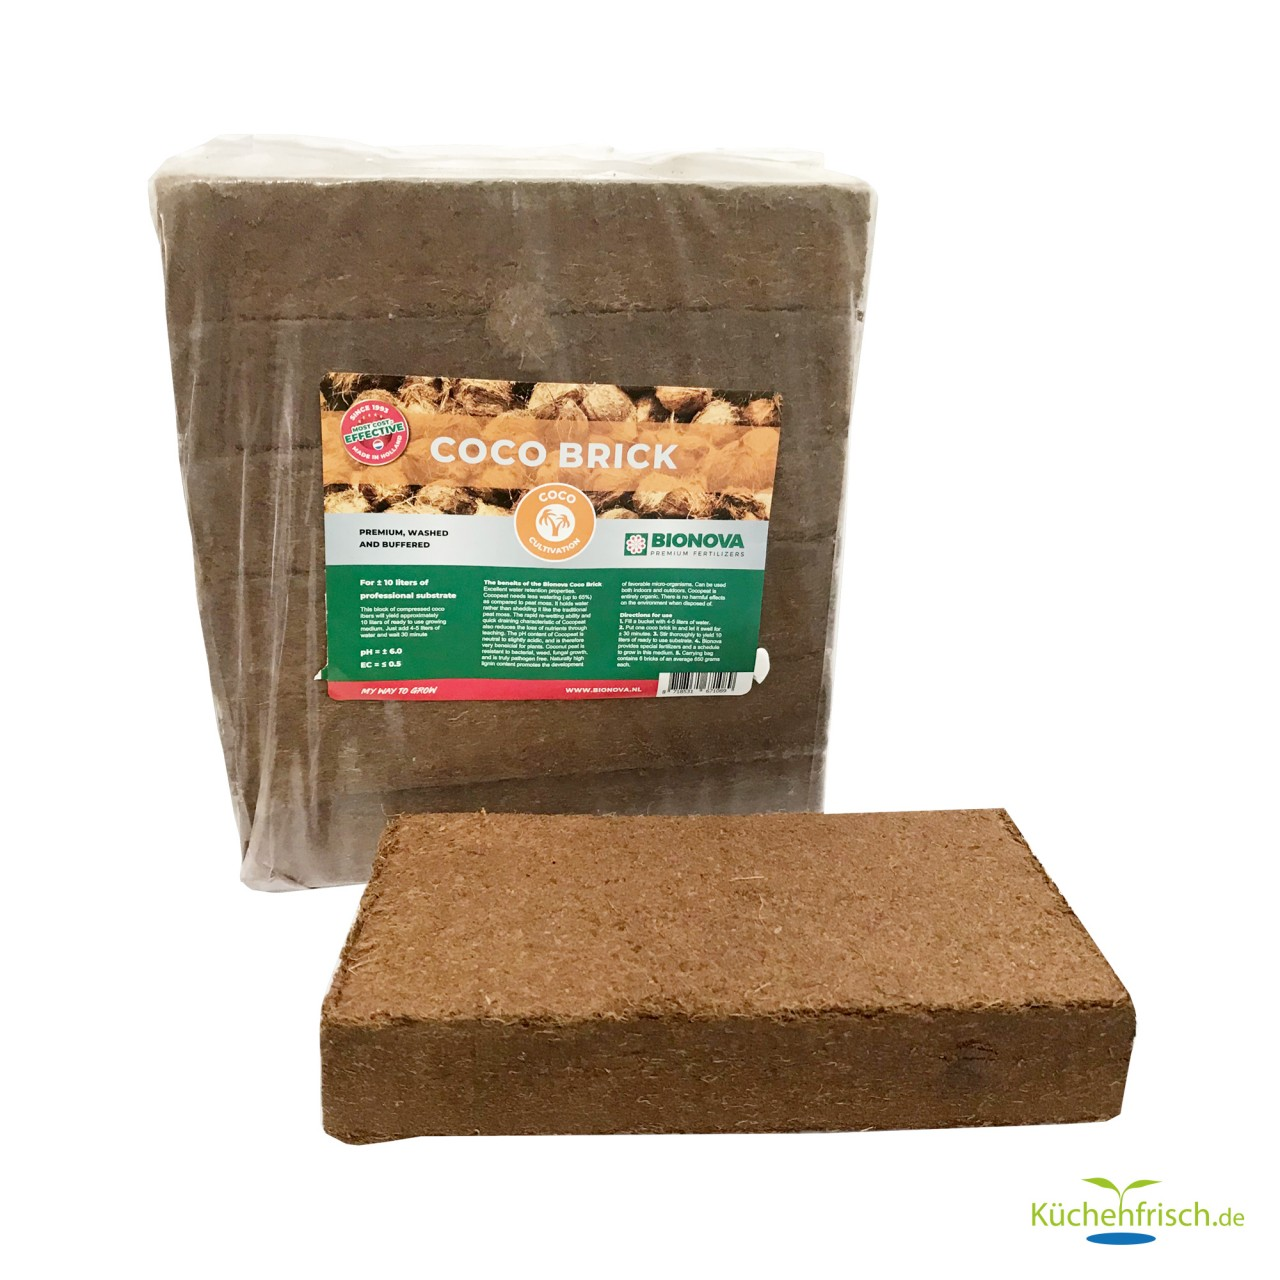 Bionova Coco Brick - Cocos Sunbstrat